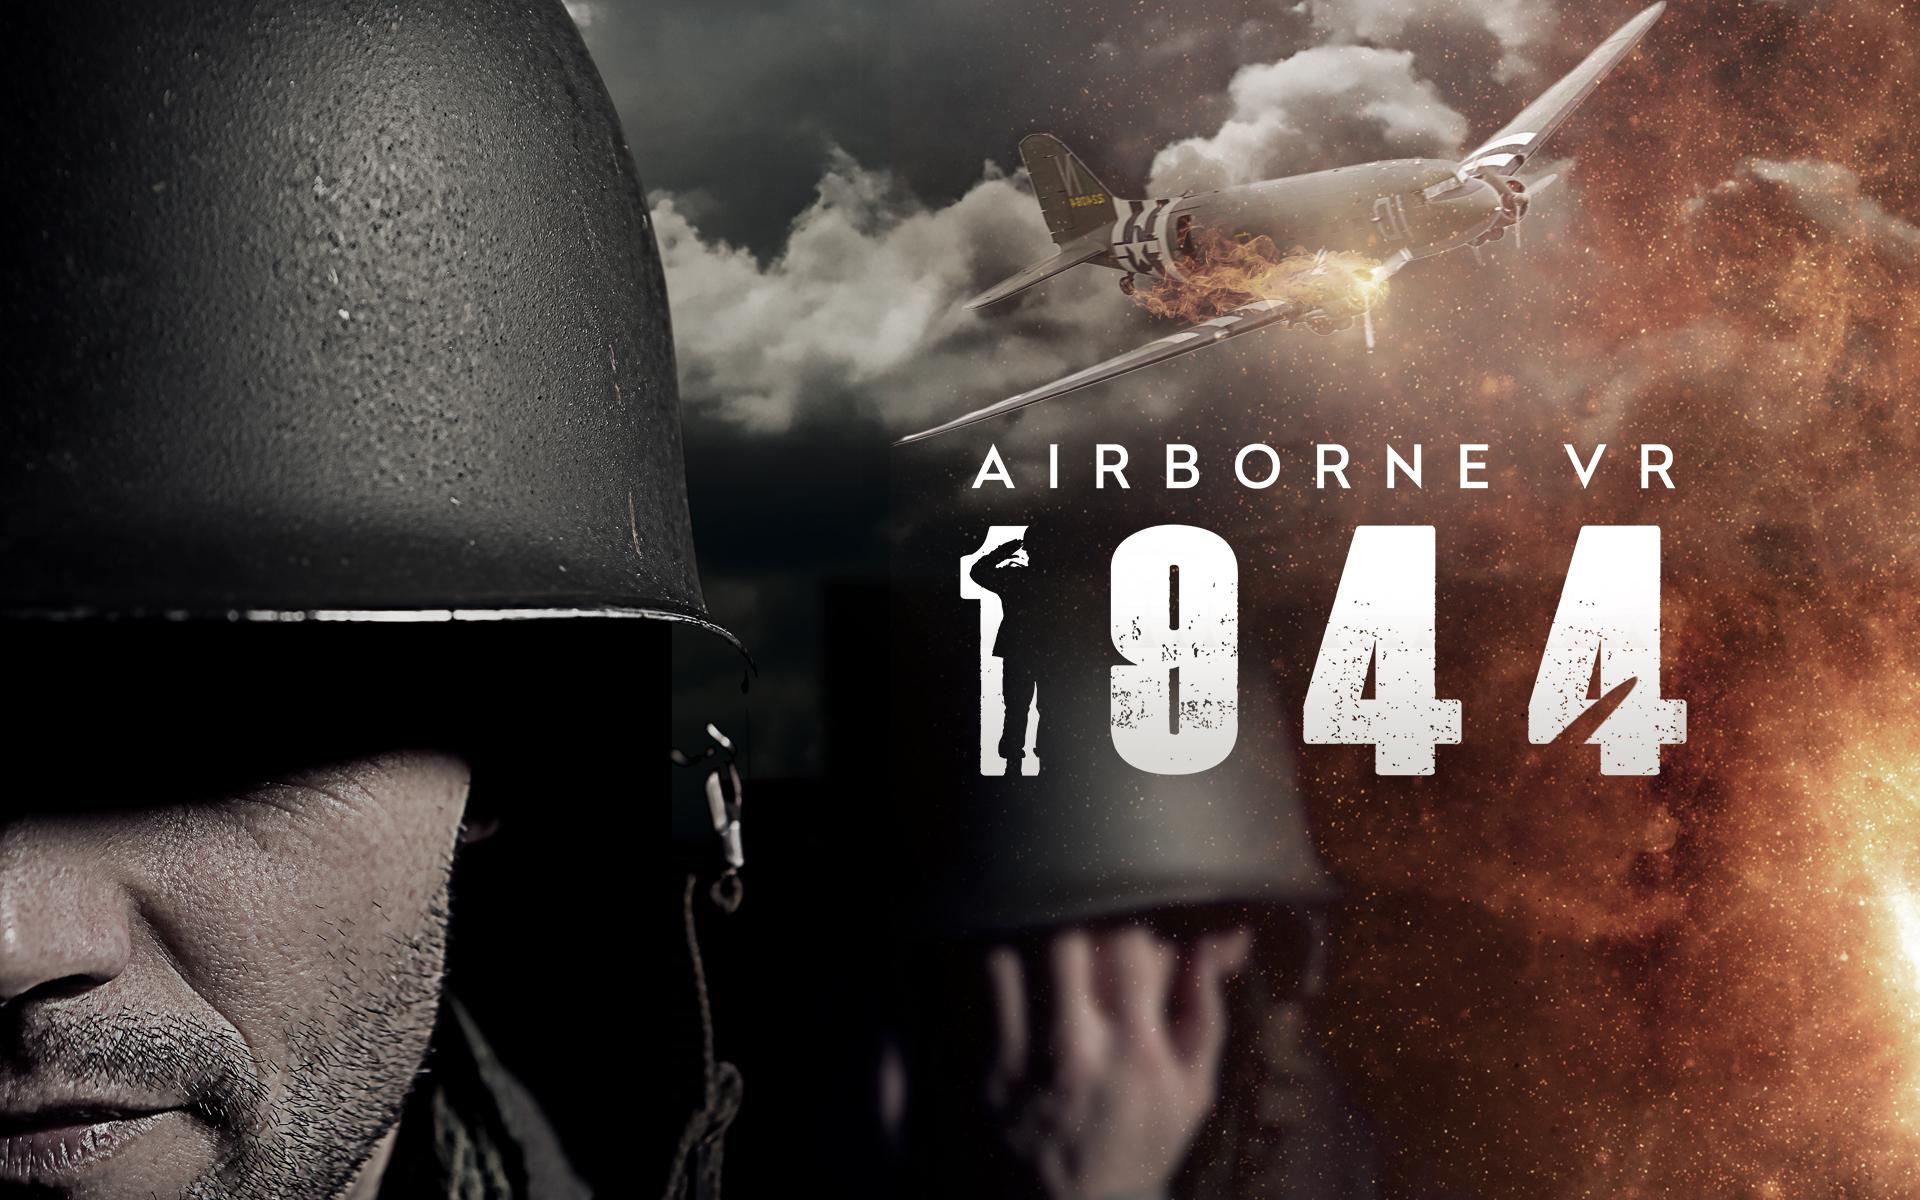 Airborne VR 1944 - Virtual Light